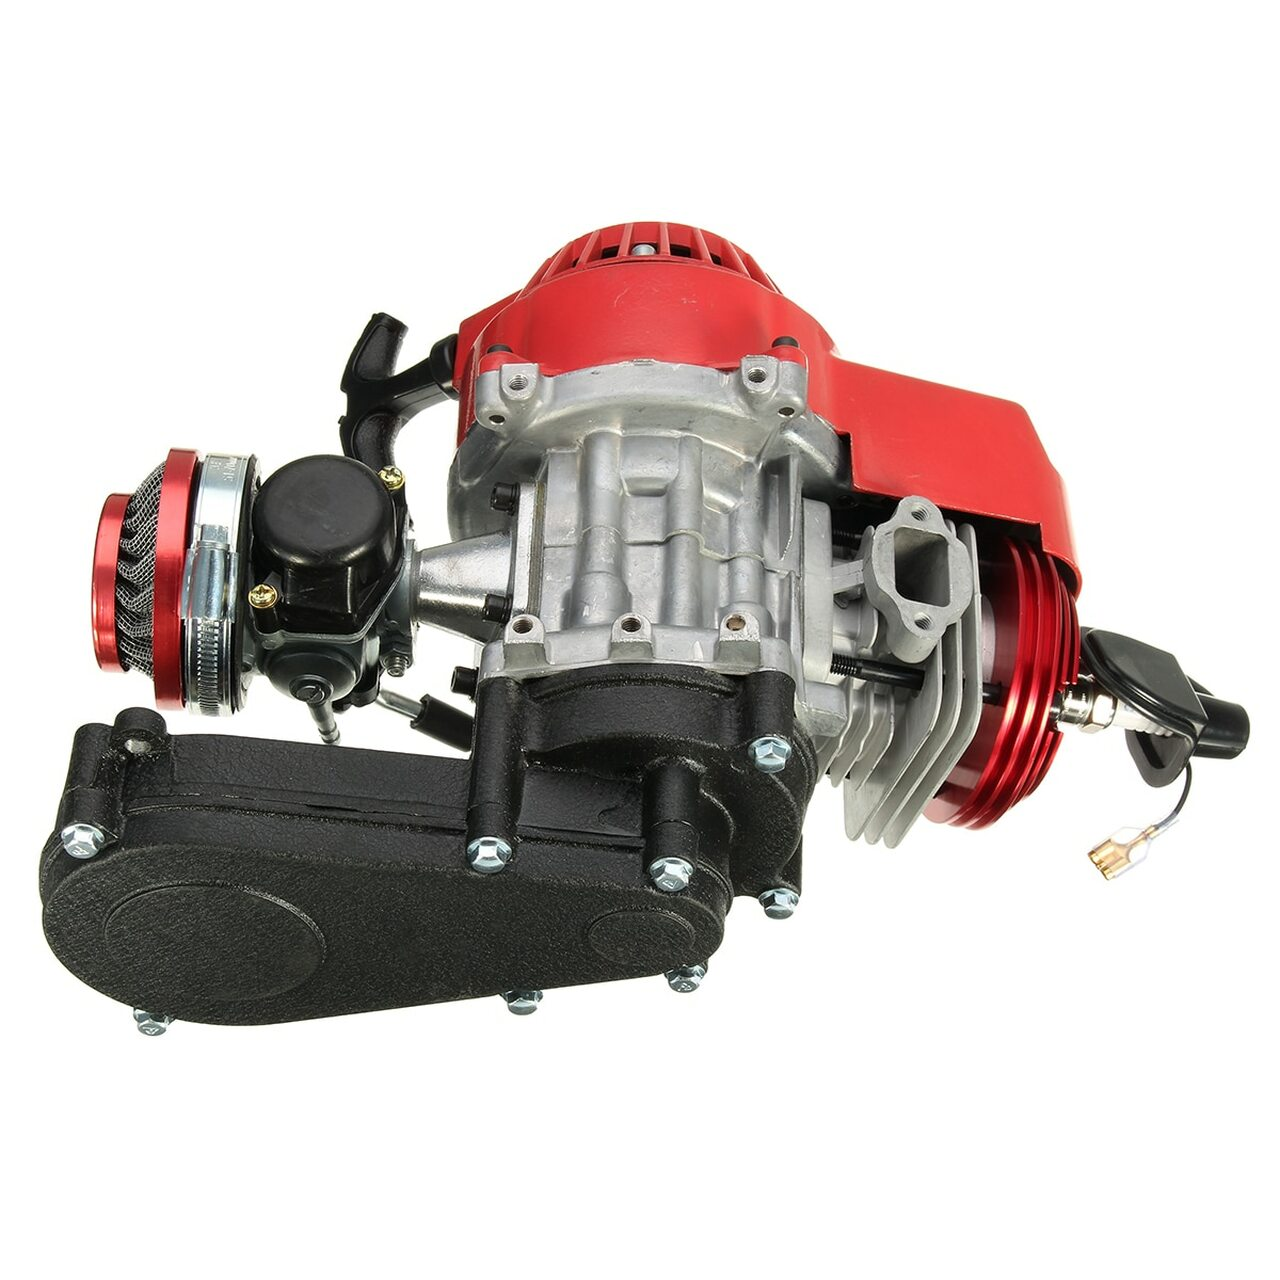 2 Stroke Engine Motor w/ Transmission CarburetorAir Filter Gear Box 49CC  Mini Dirt Bike ATV Quad Blue Yellow Black Red Sliver